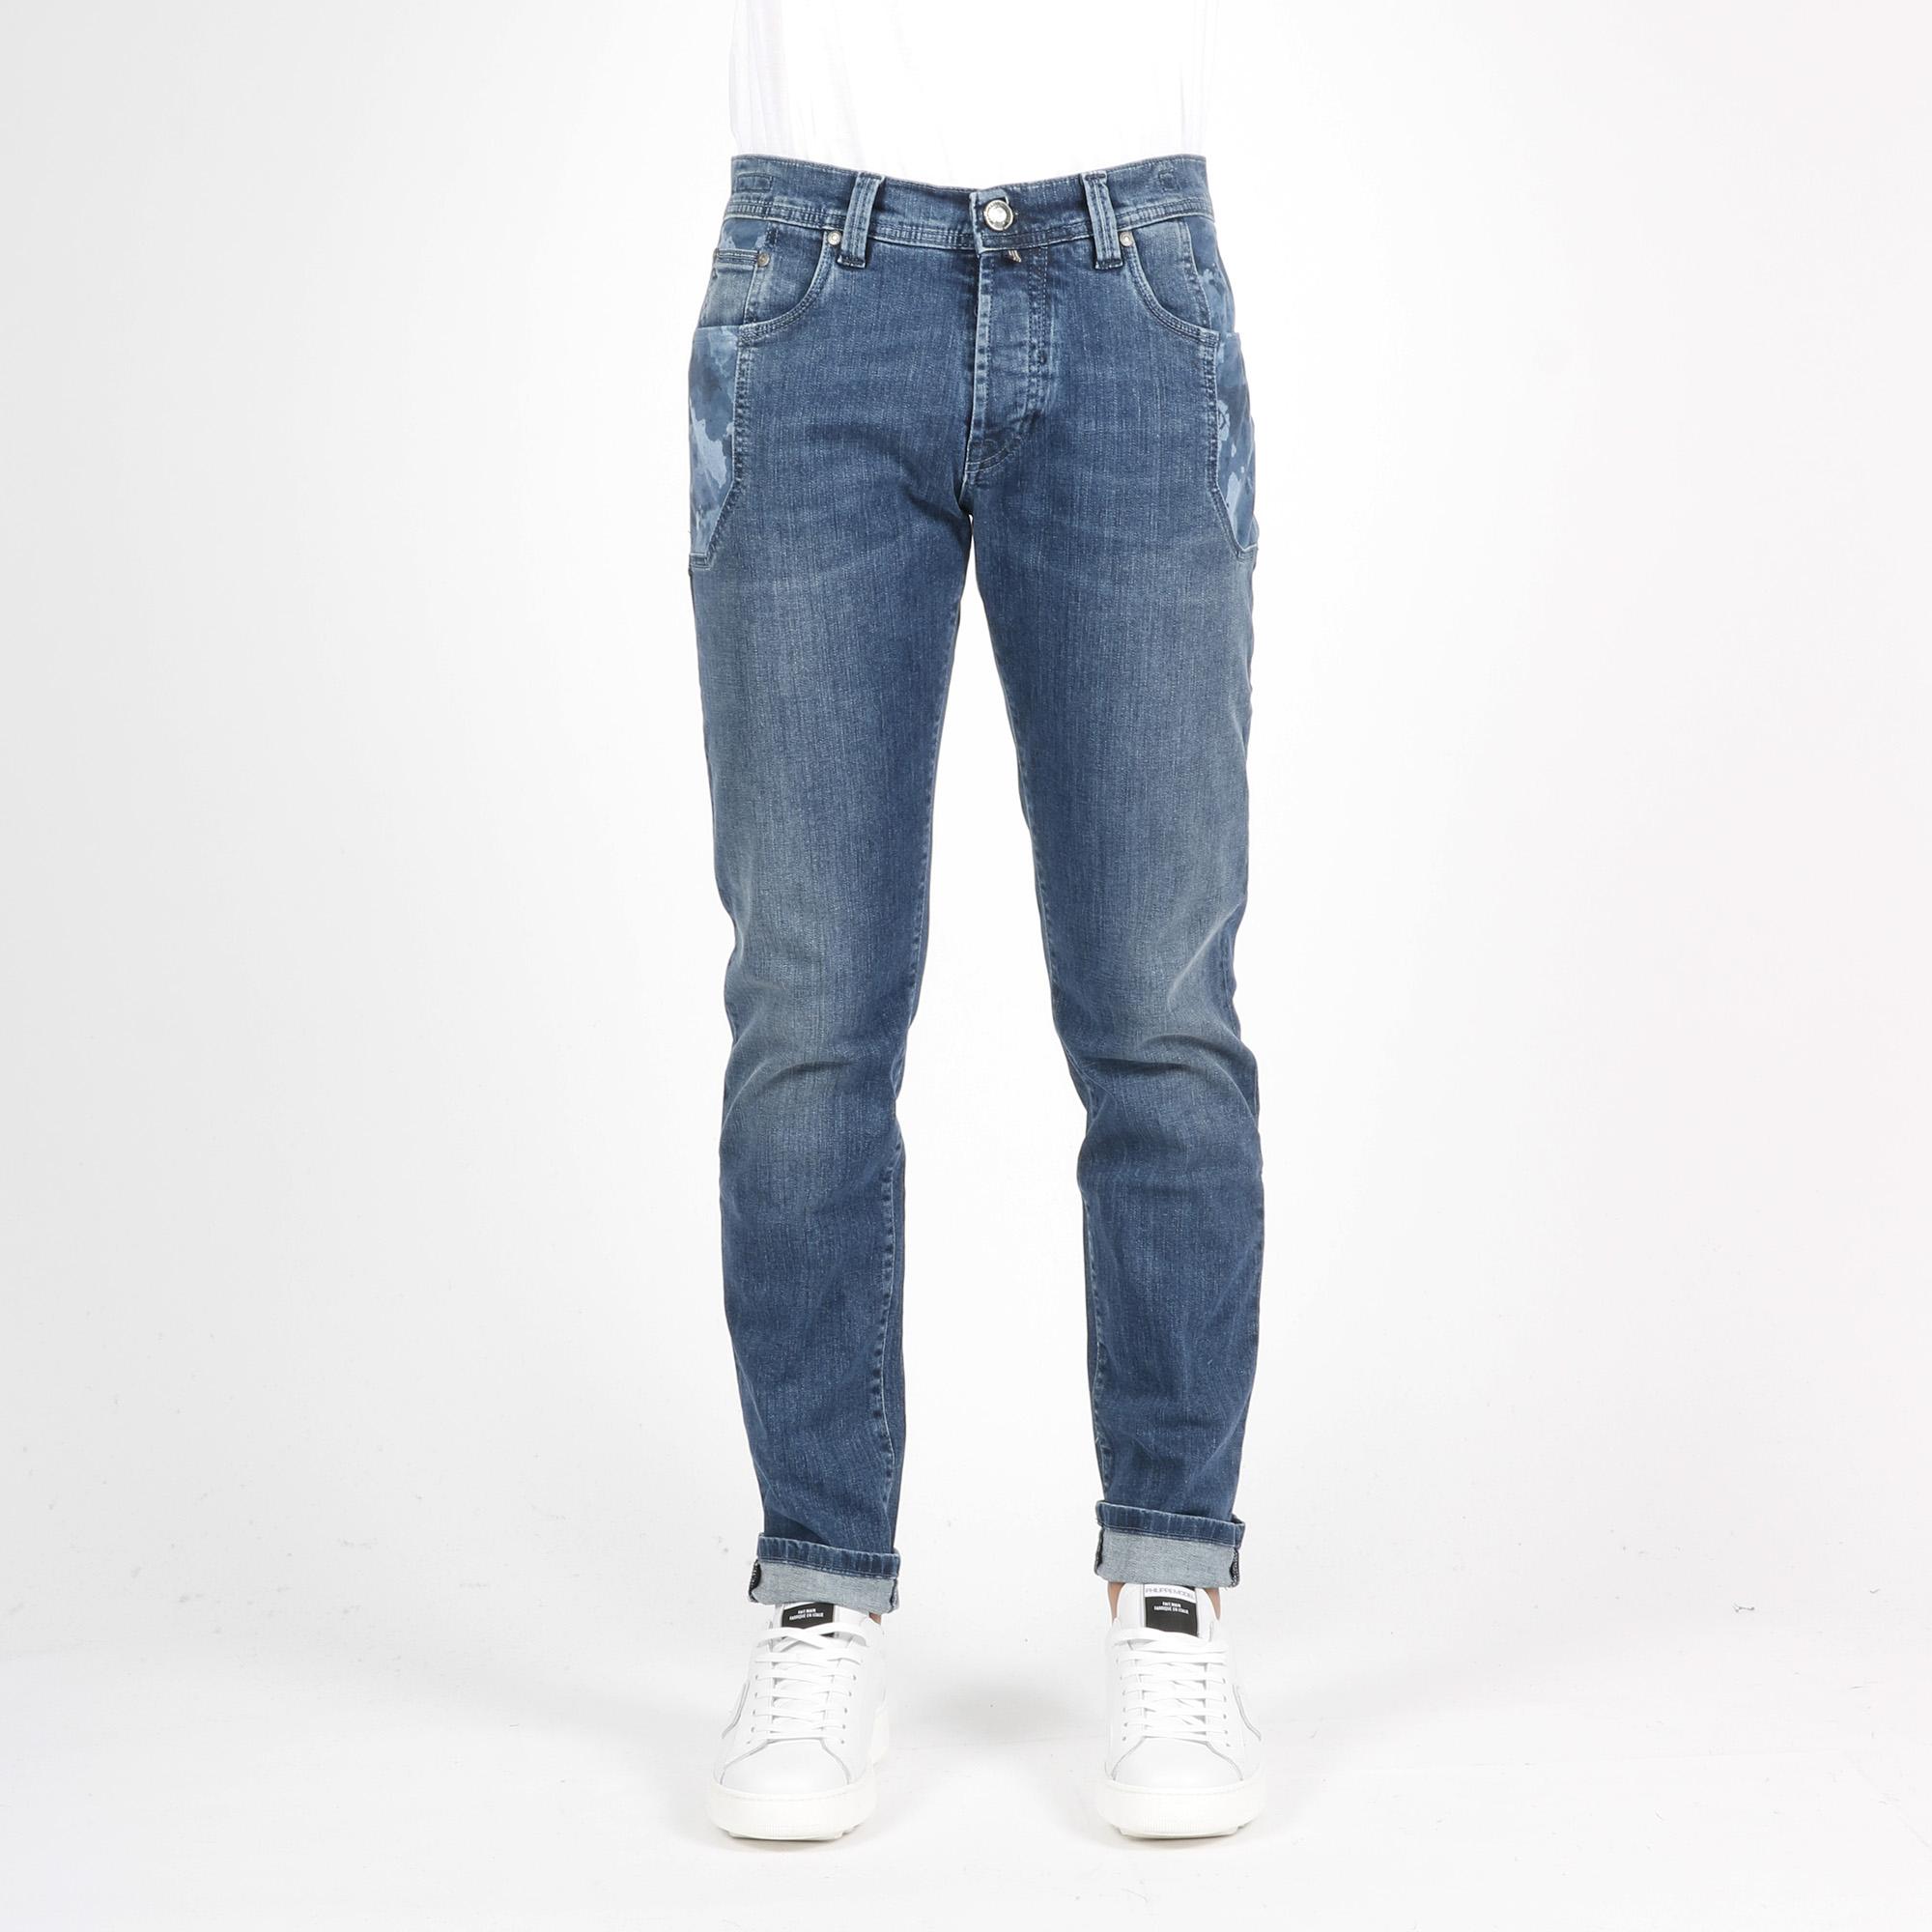 Jeans towel alcantara - Camouflage blu